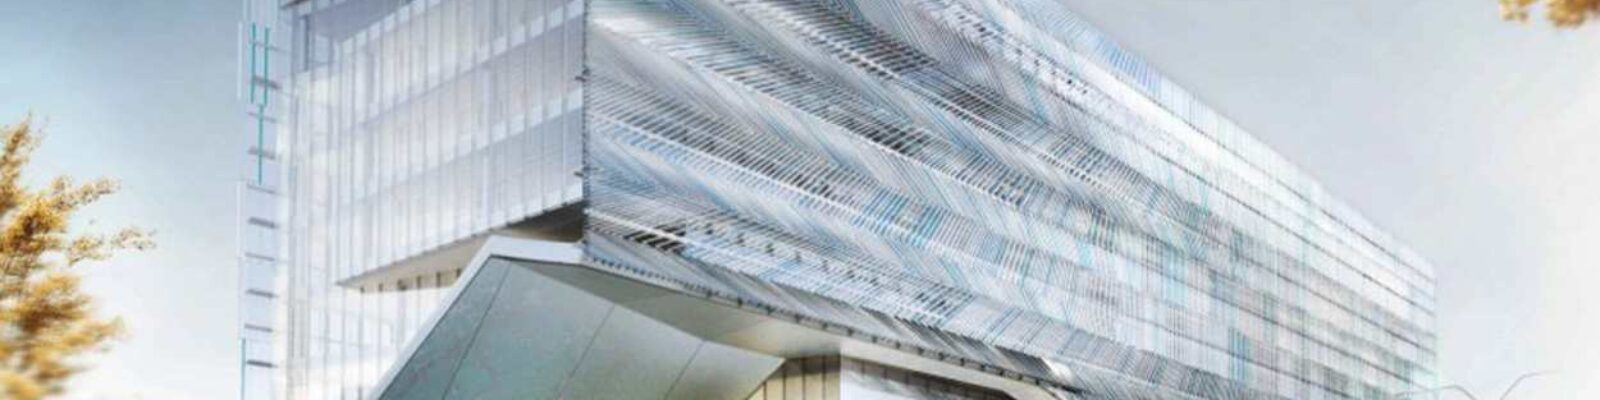 San Donato SNAM Headquarters - architectural lighting